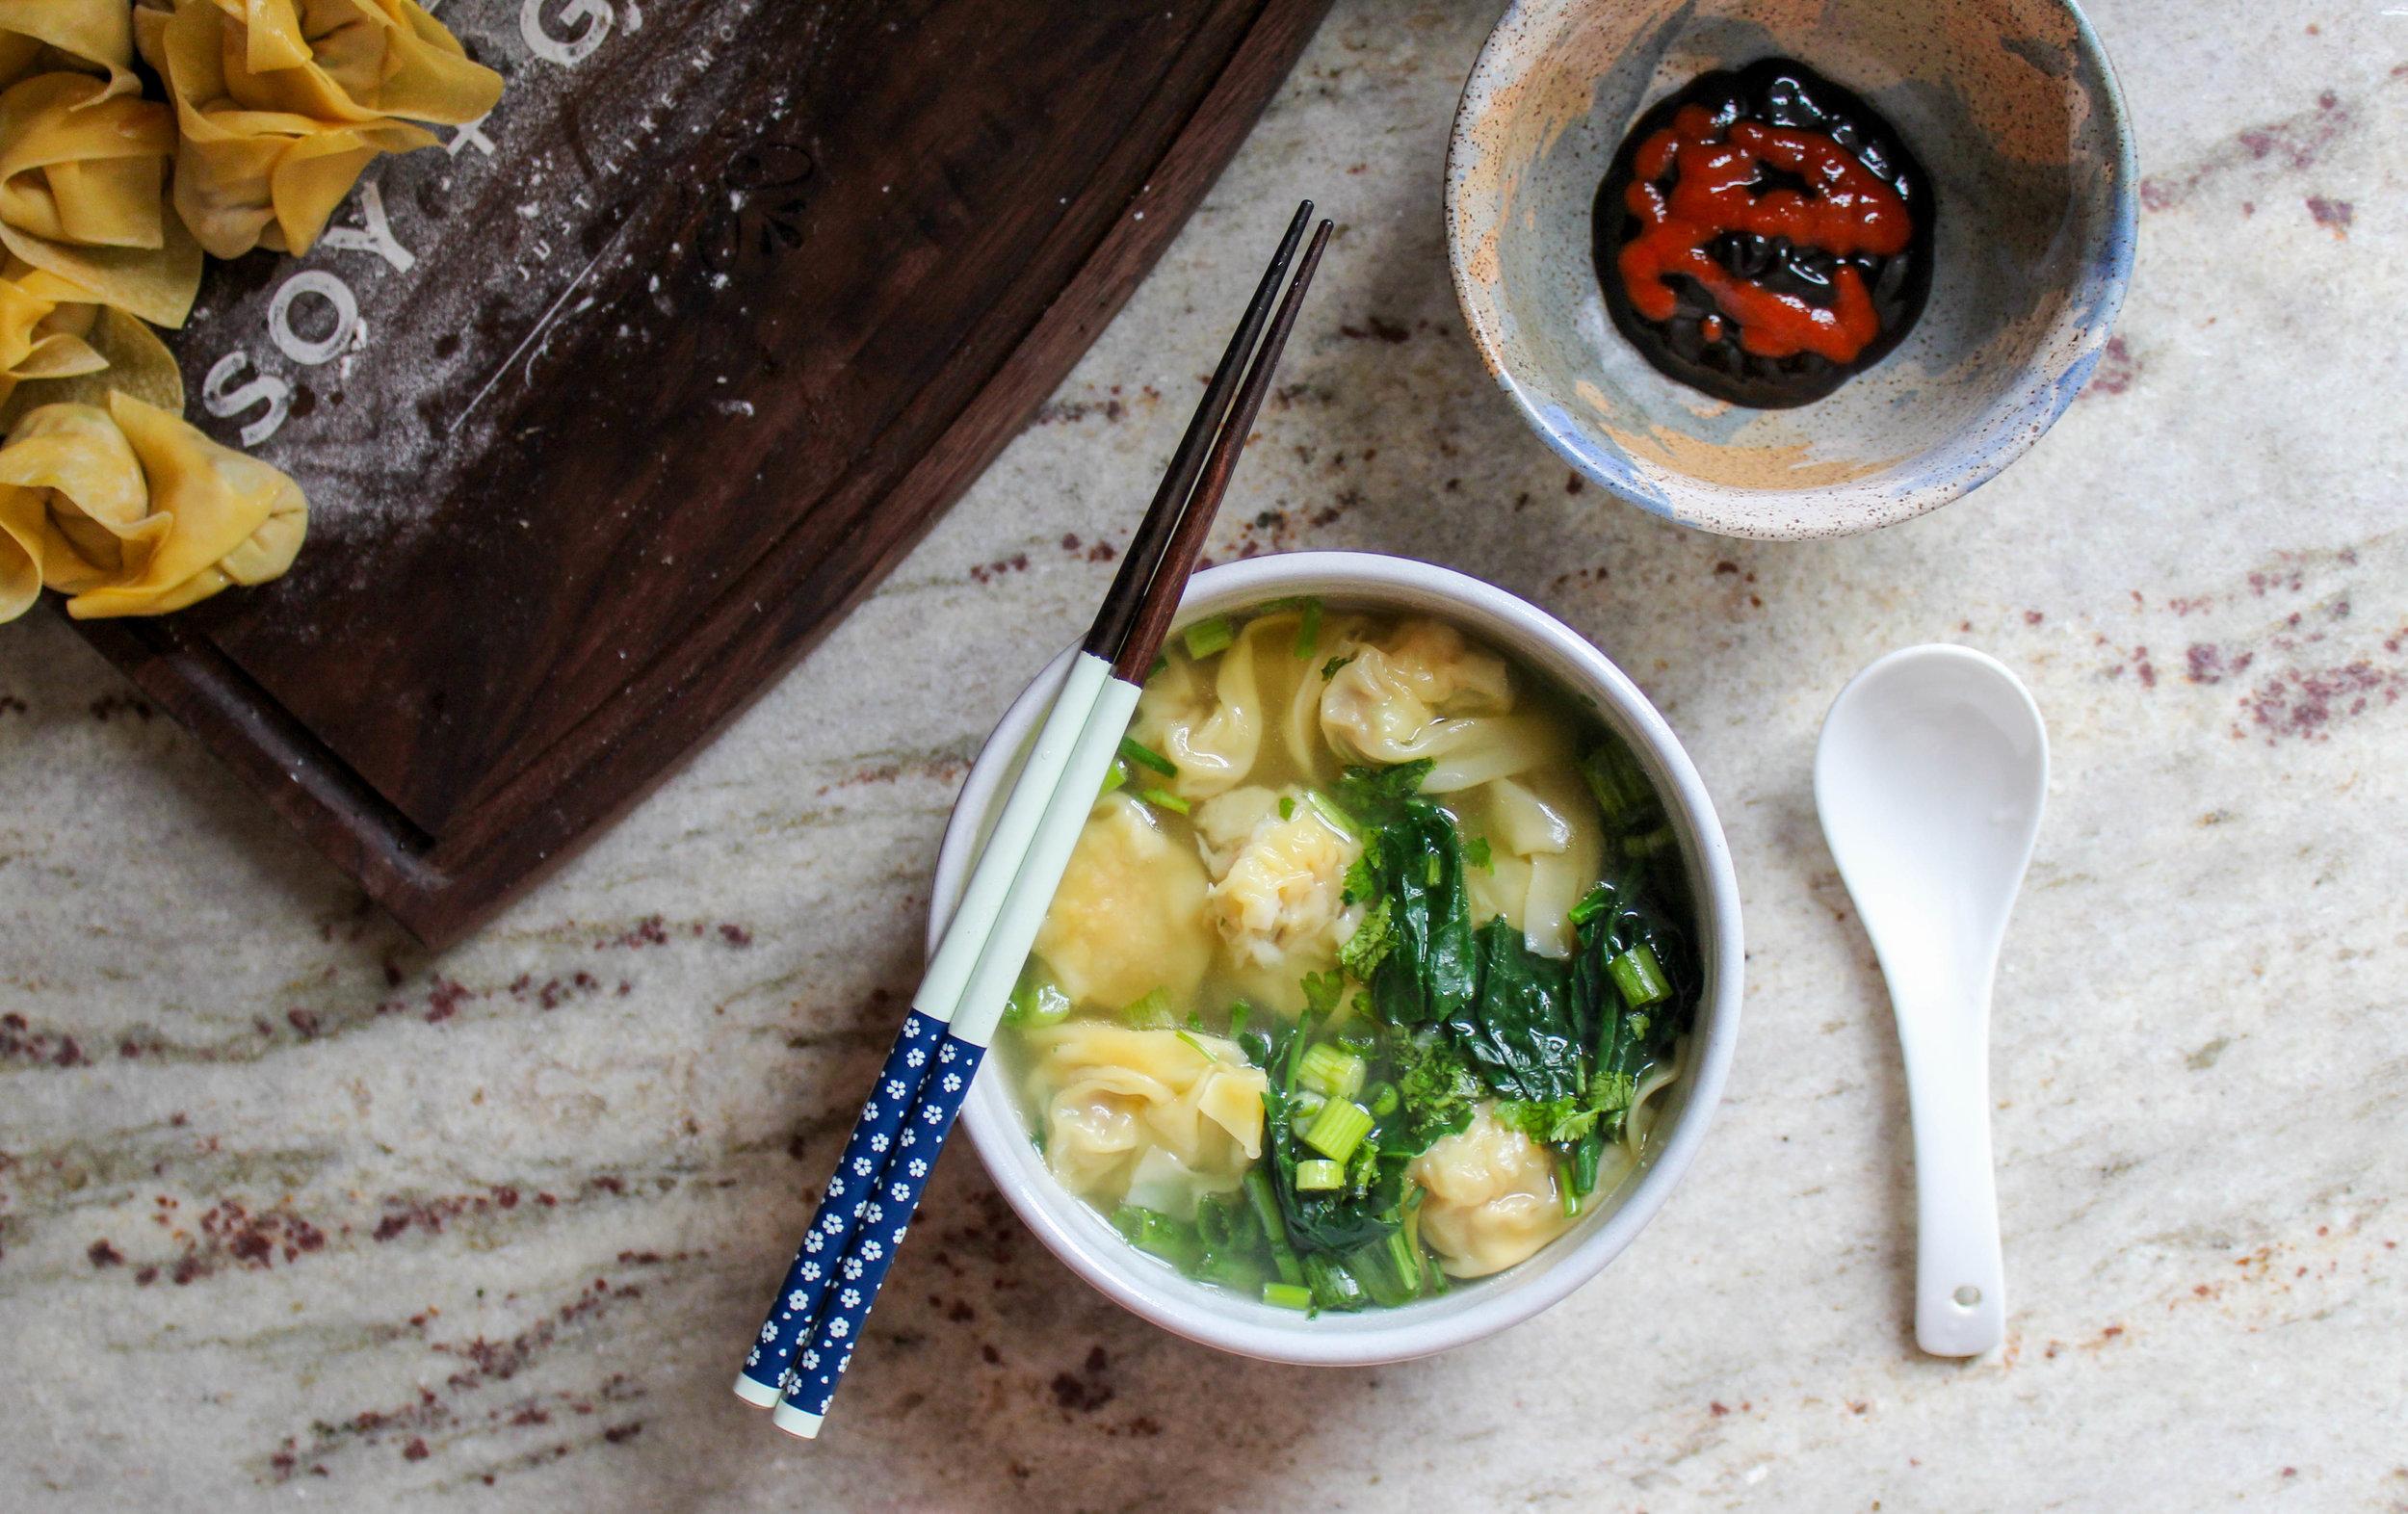 pork and shrimp wonton with tuscan kale